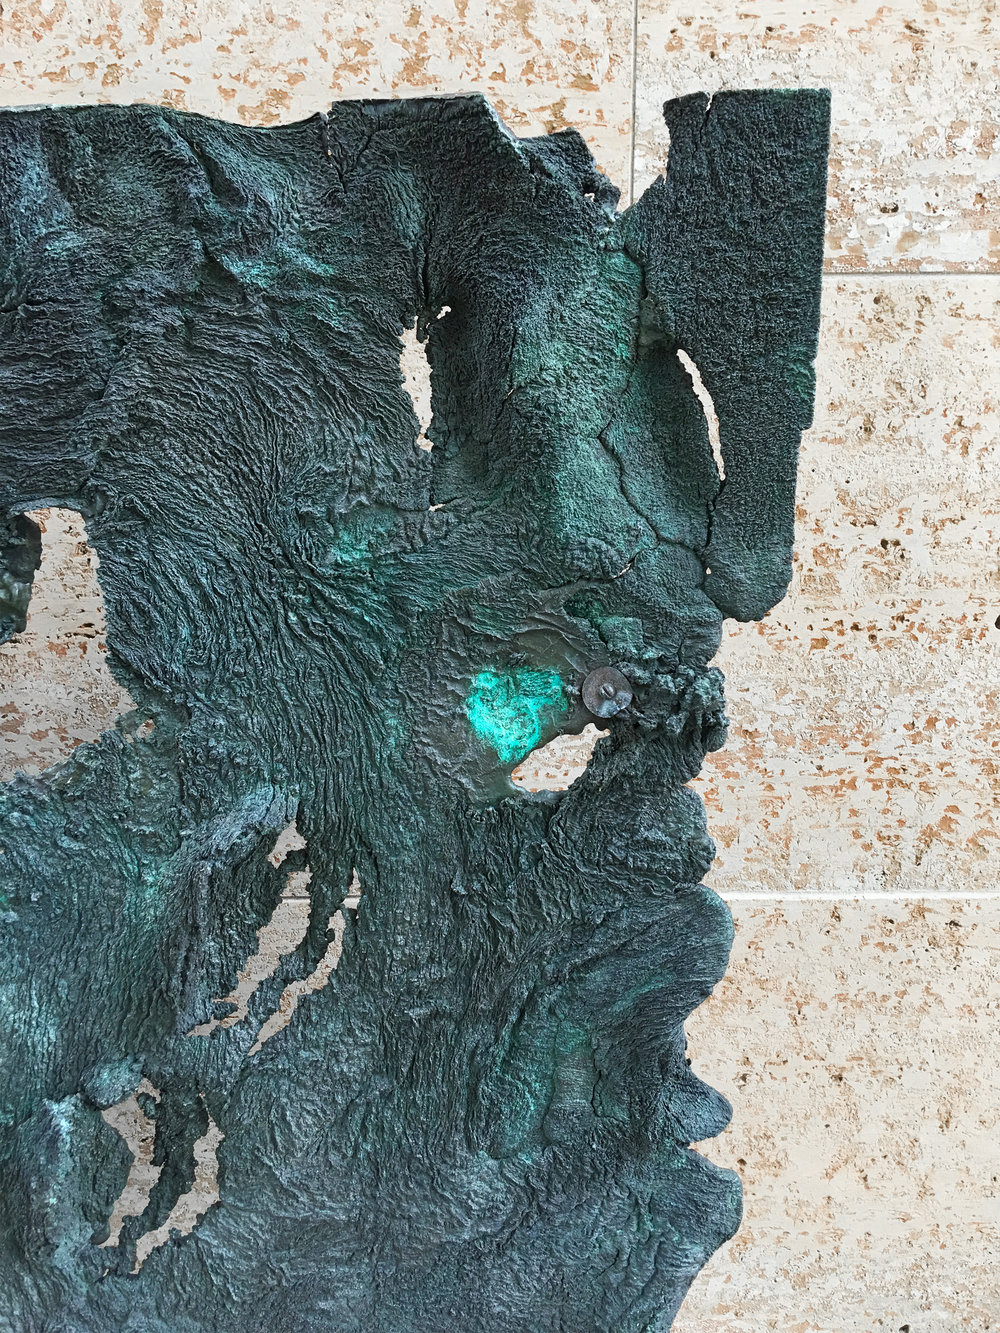 Sculpture by Harry Bertoia, Cranbrook Art Museum